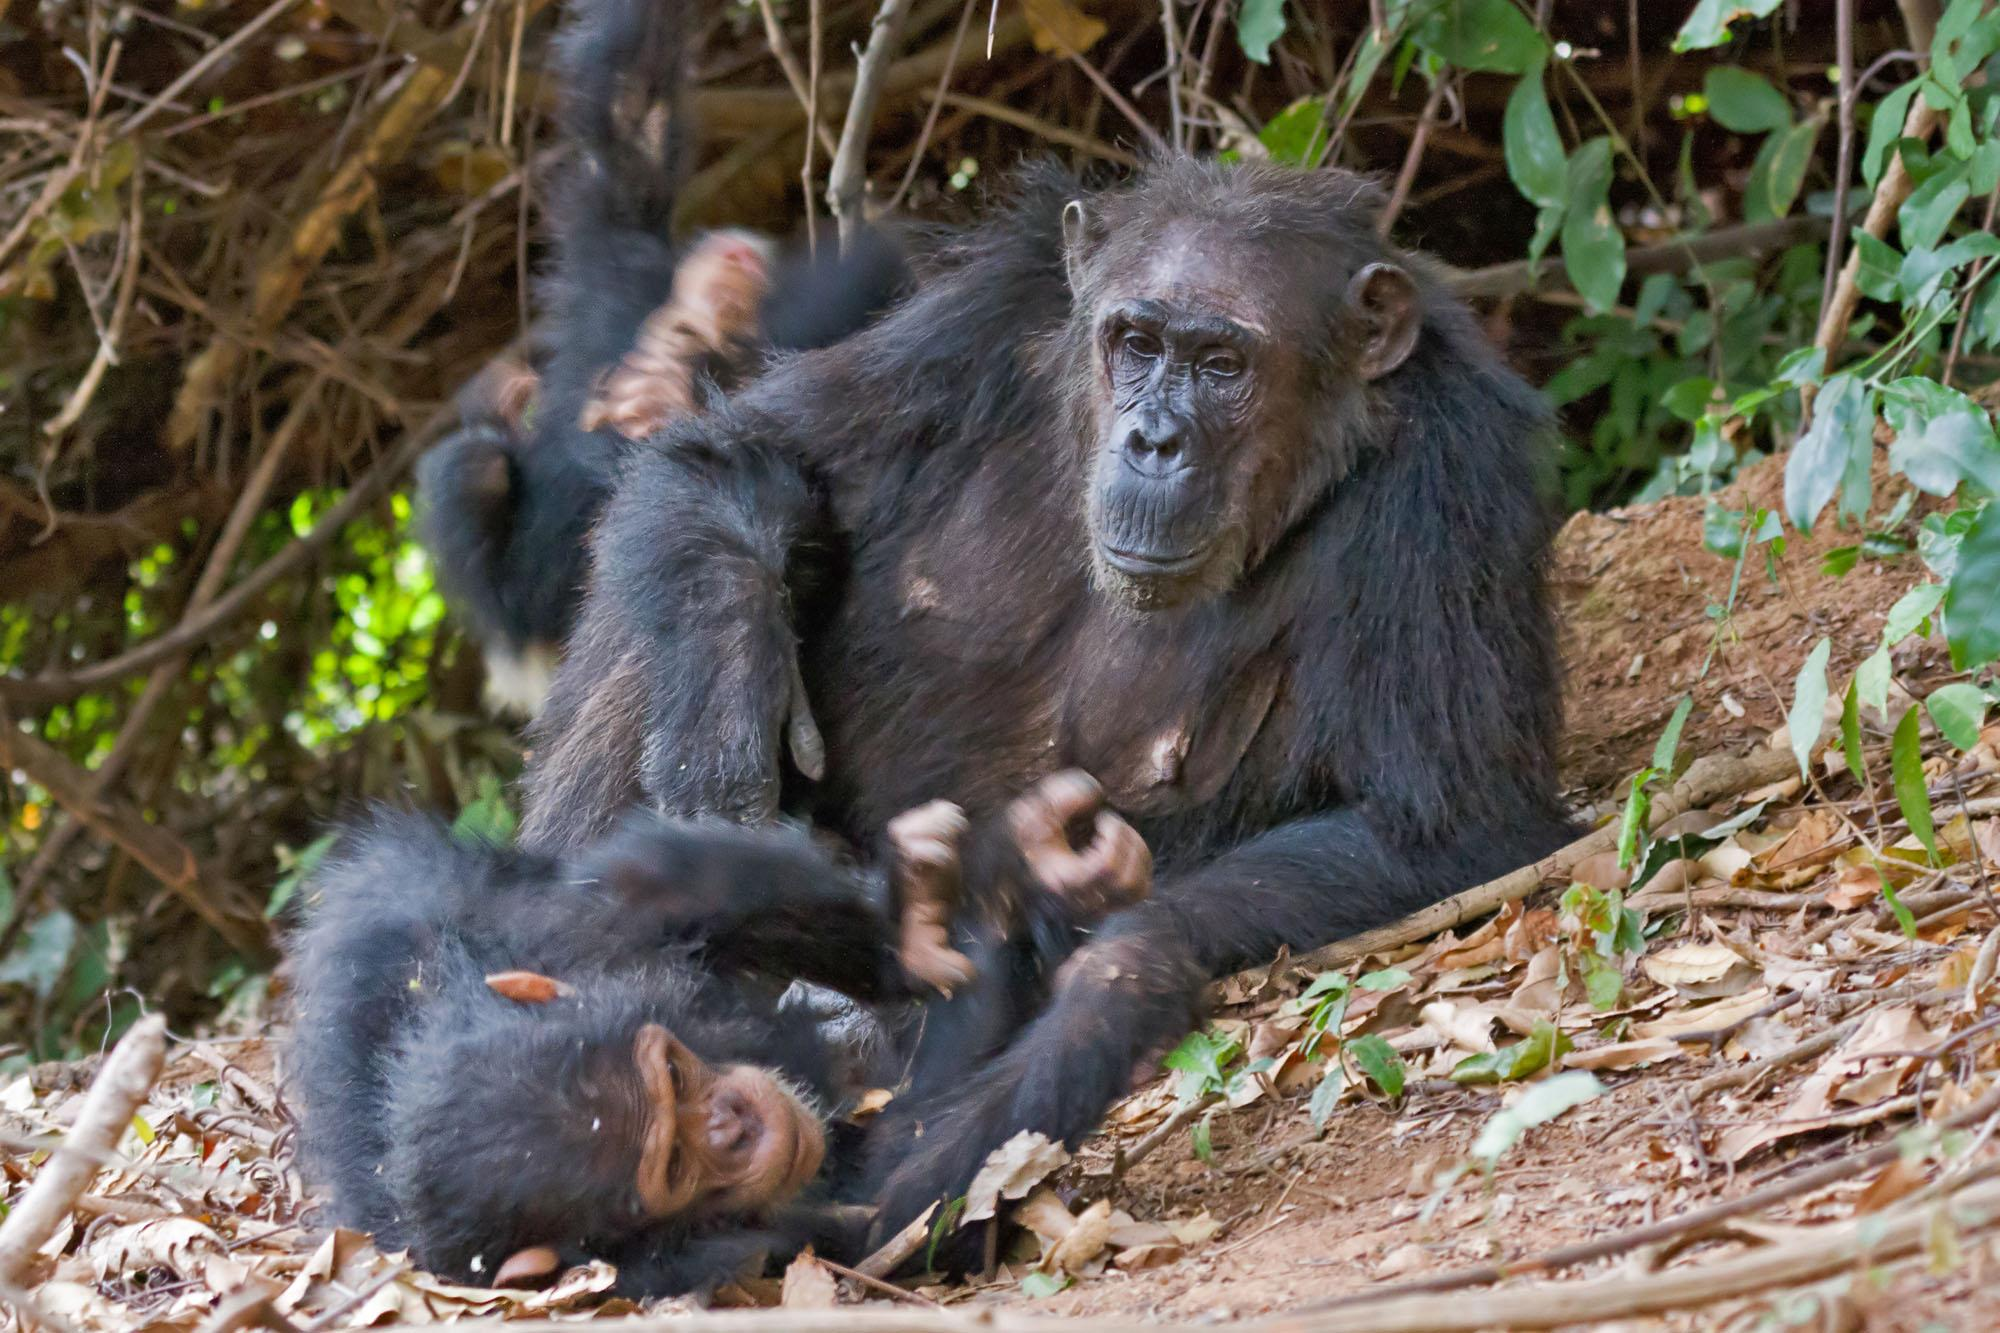 Самцы шимпанзе оказались заботливыми отцами